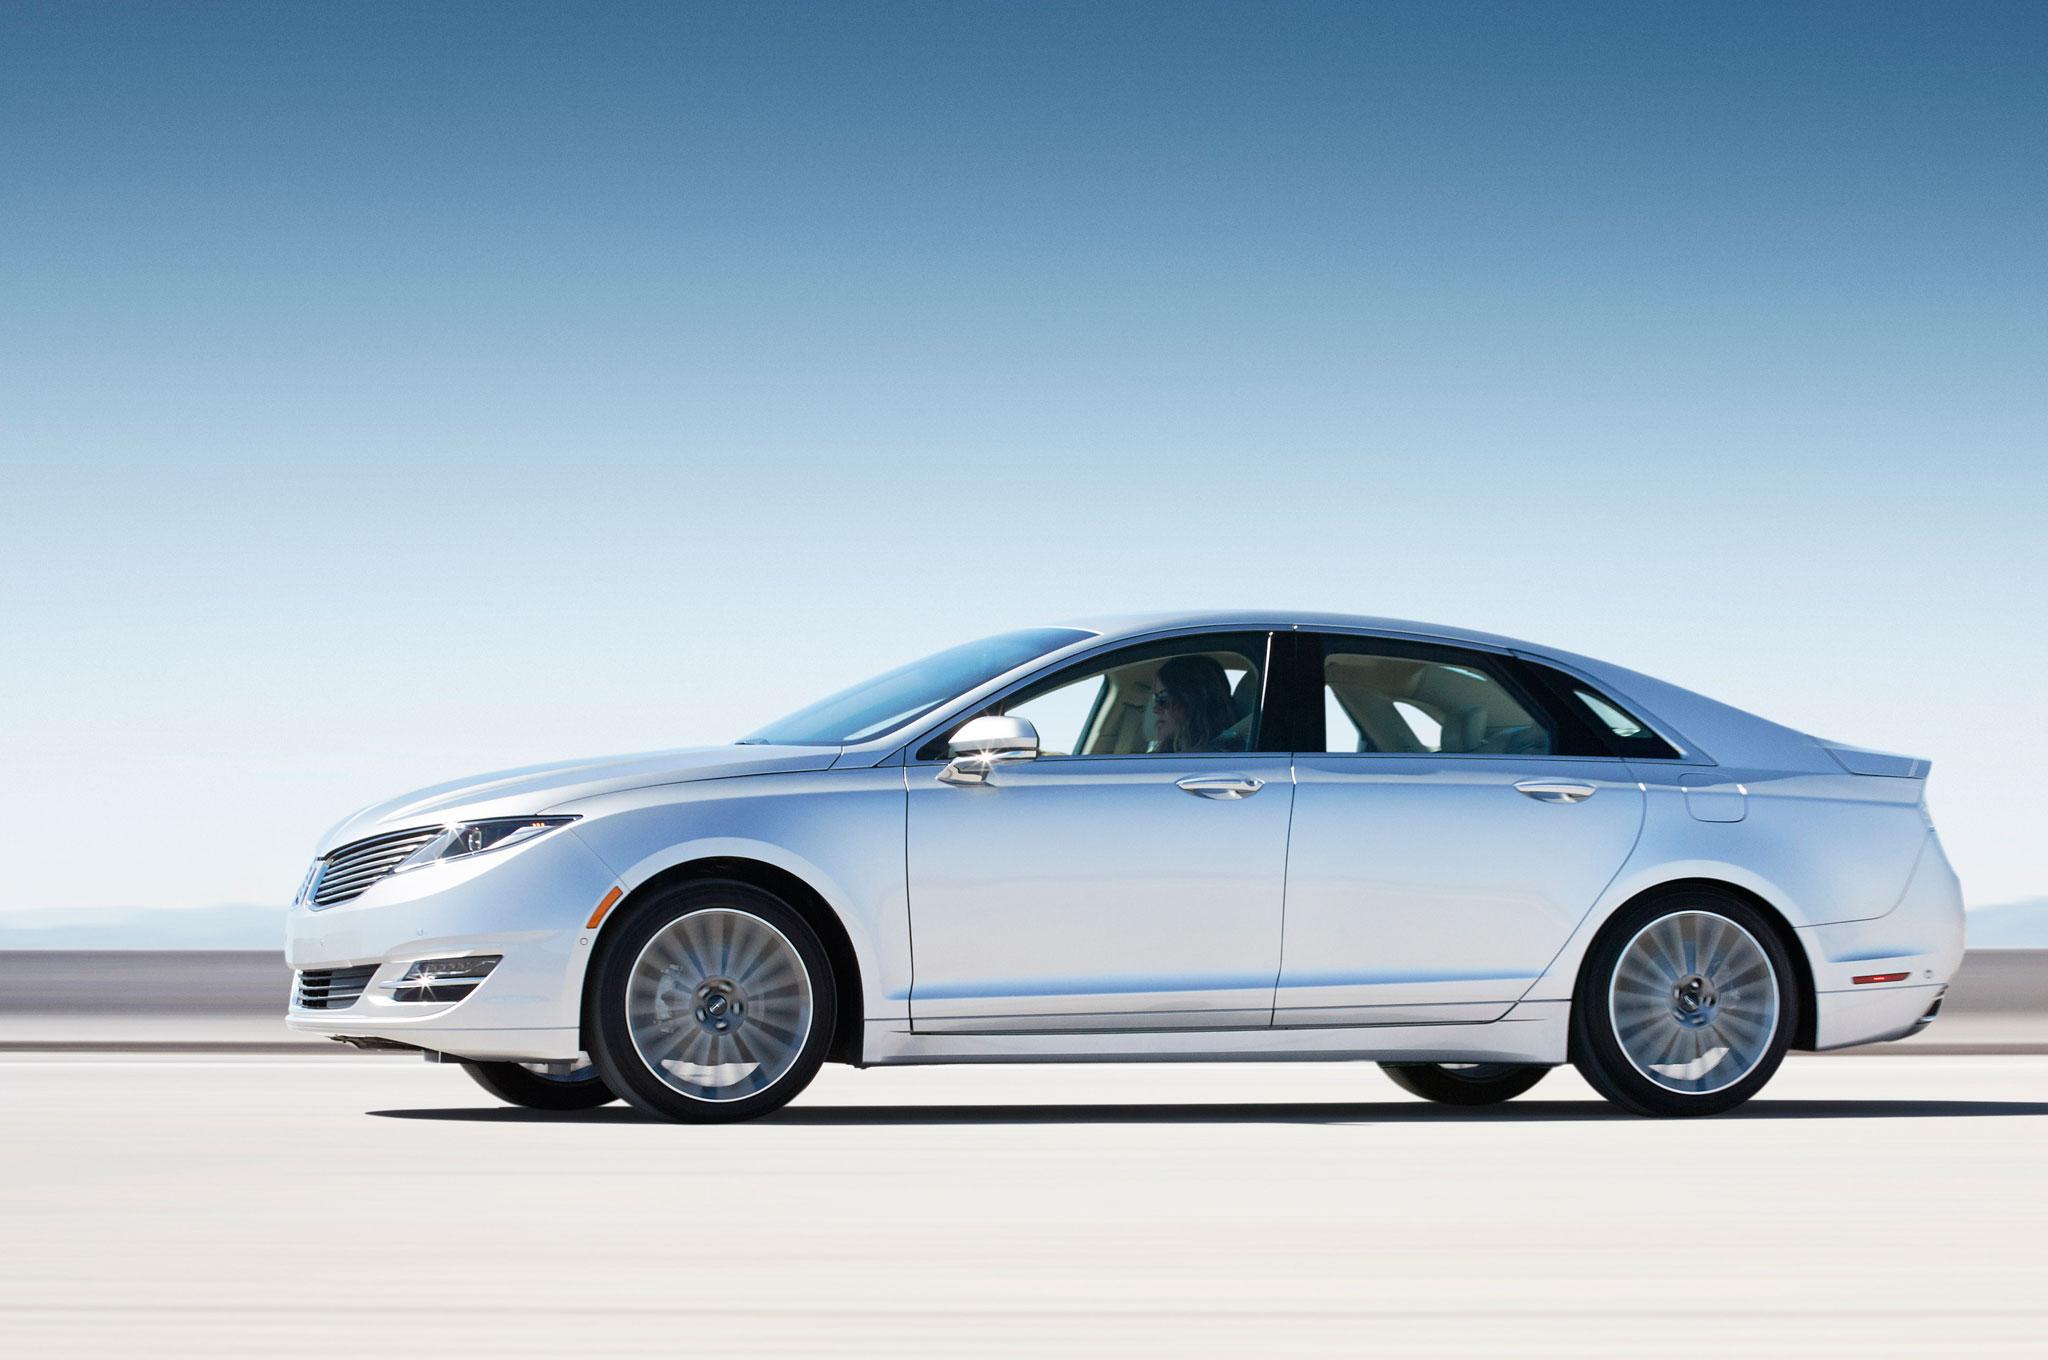 2013 Lincoln MKZ Hybrid First Drive - Automobile Magazine